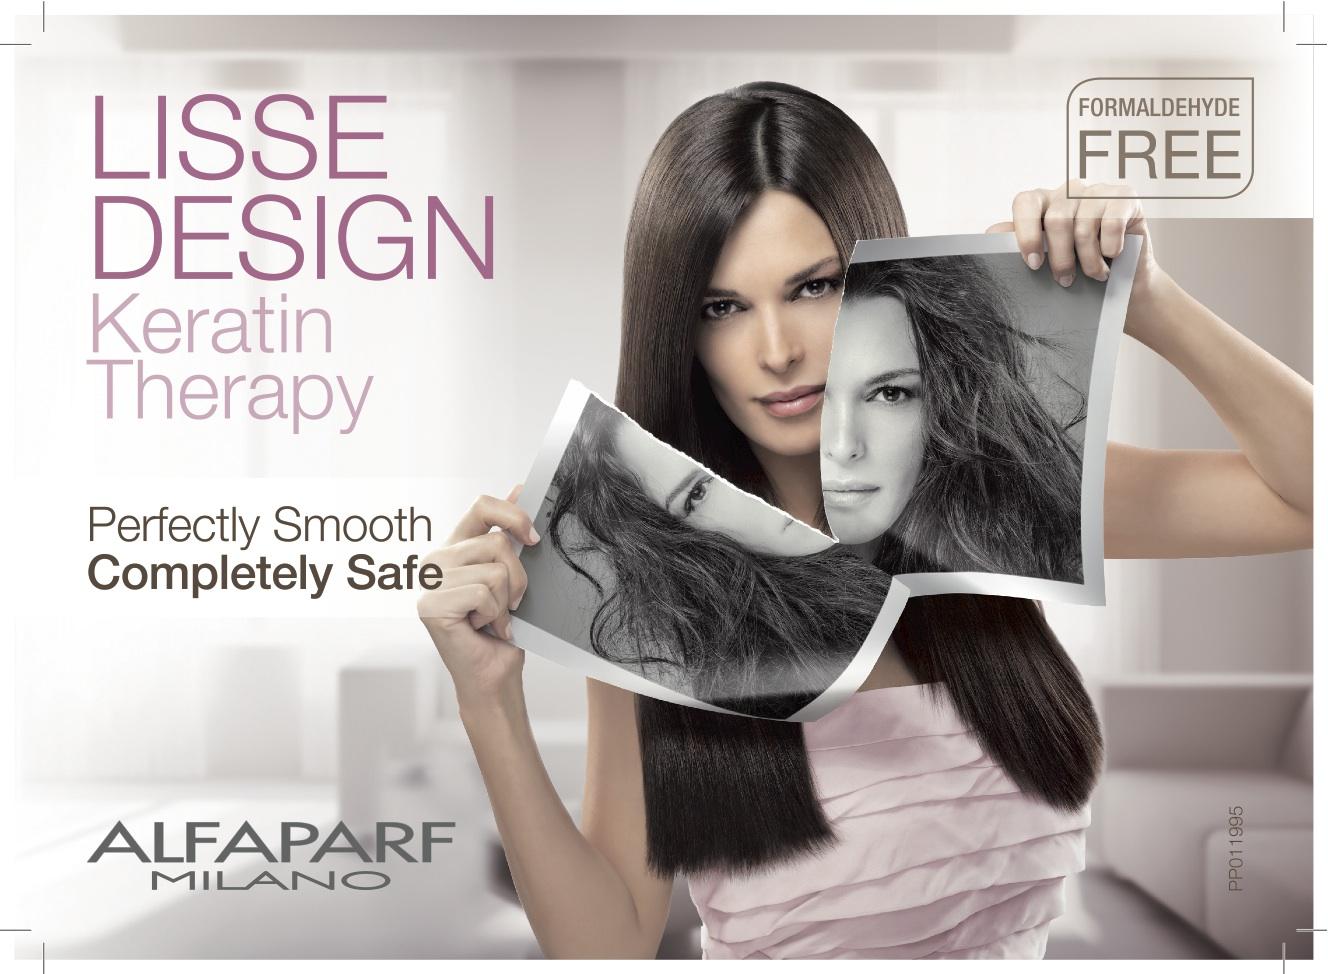 Alfaparf Lisse Design Keratin Therapy Keratin Treatment